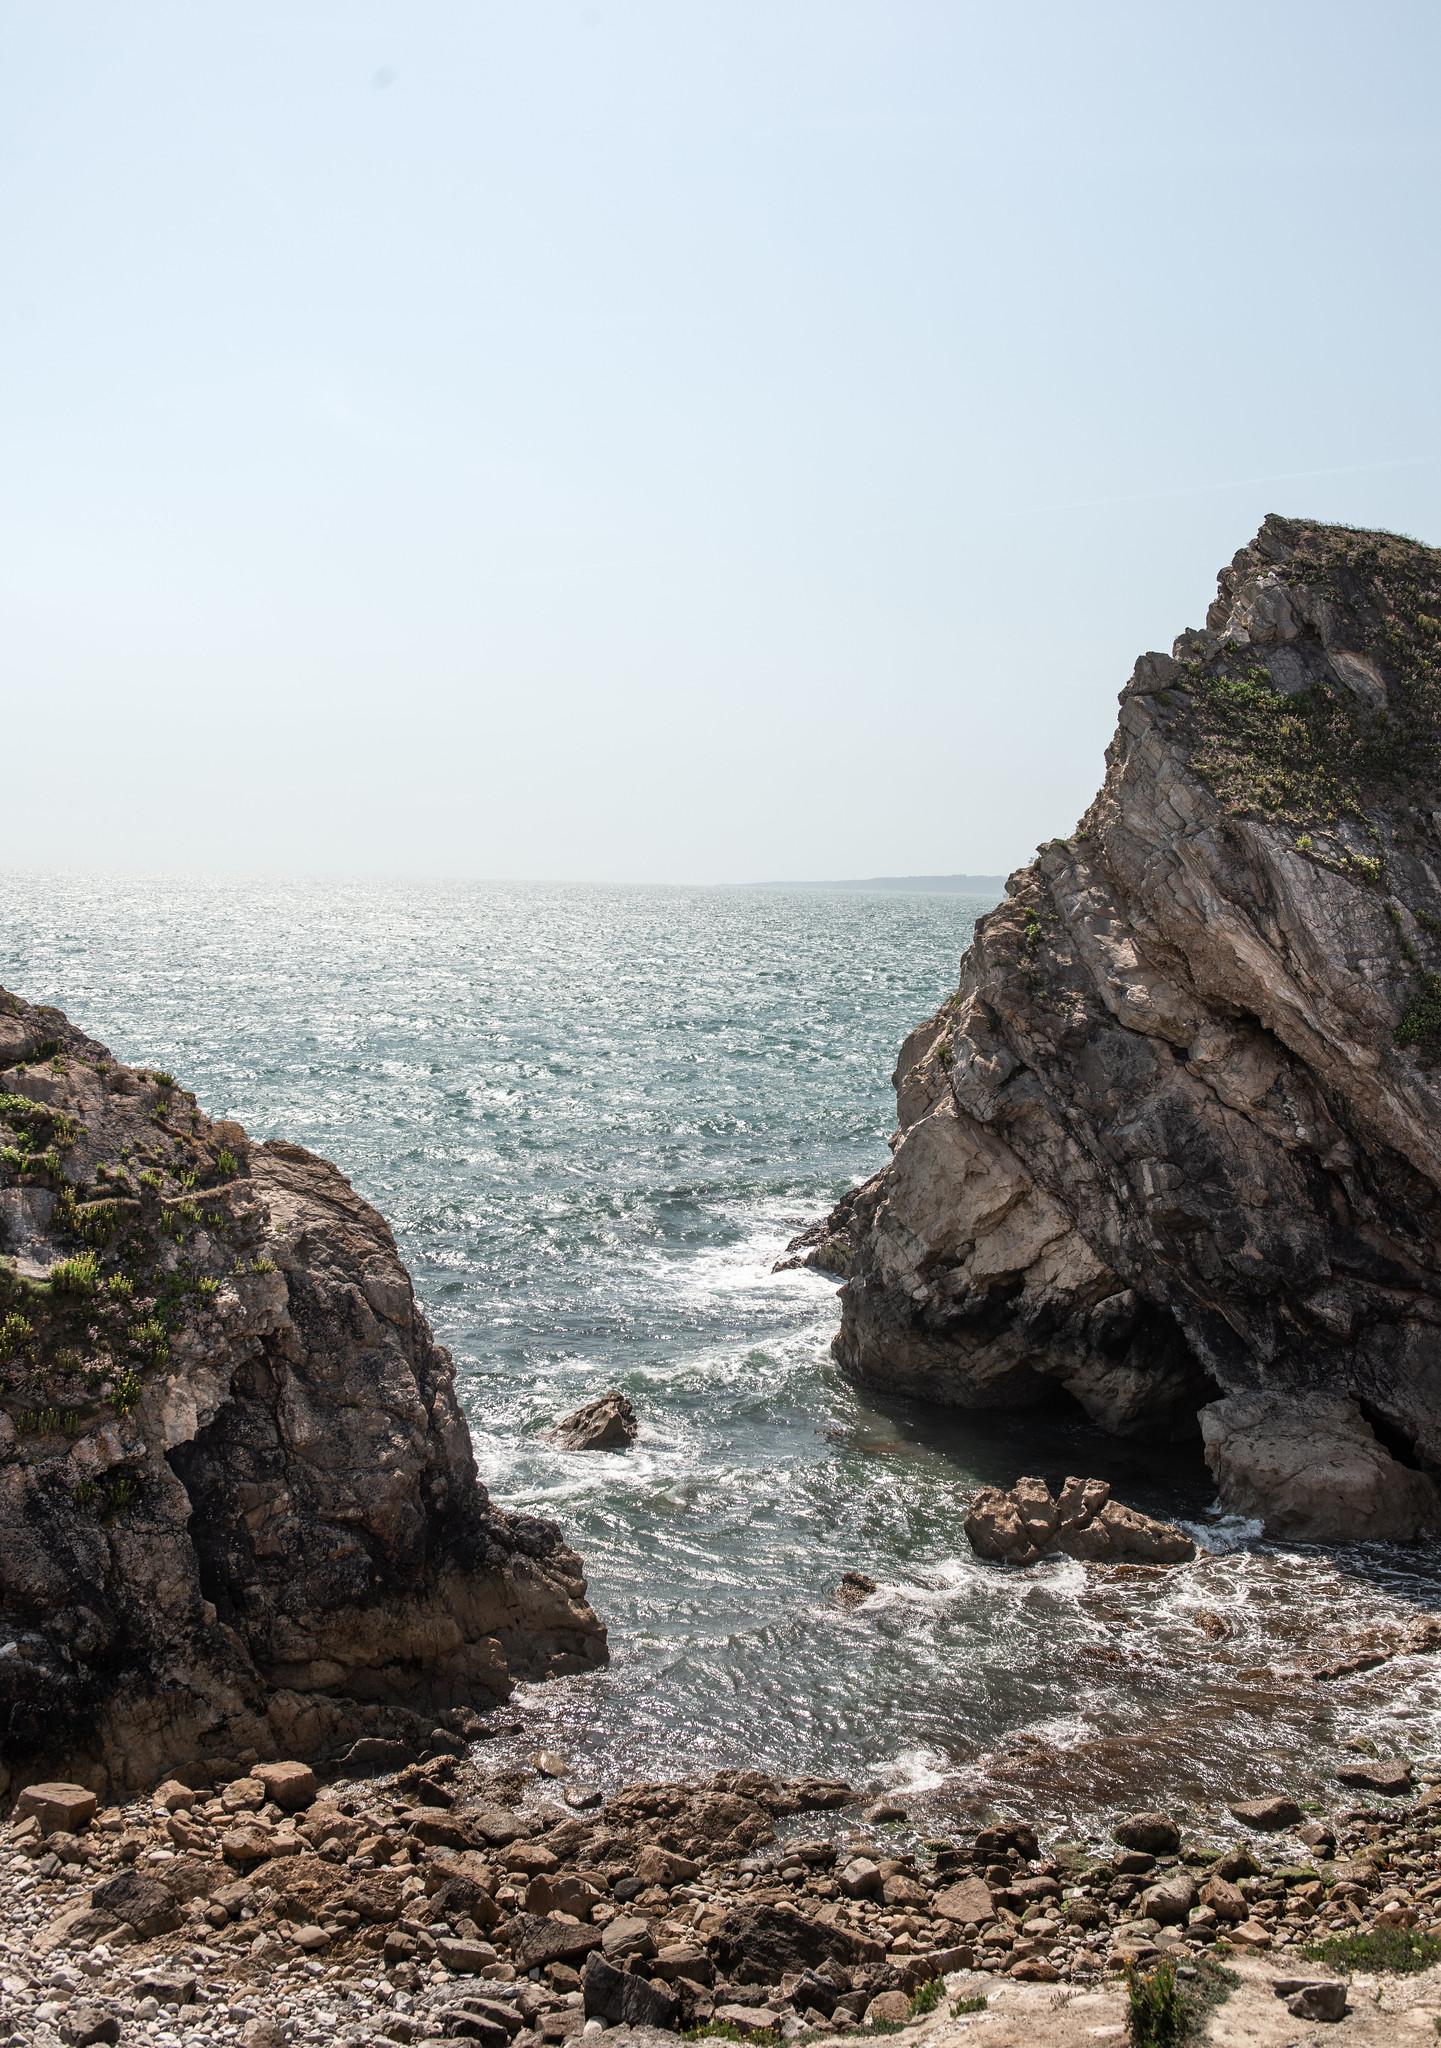 Jurassic Coastline